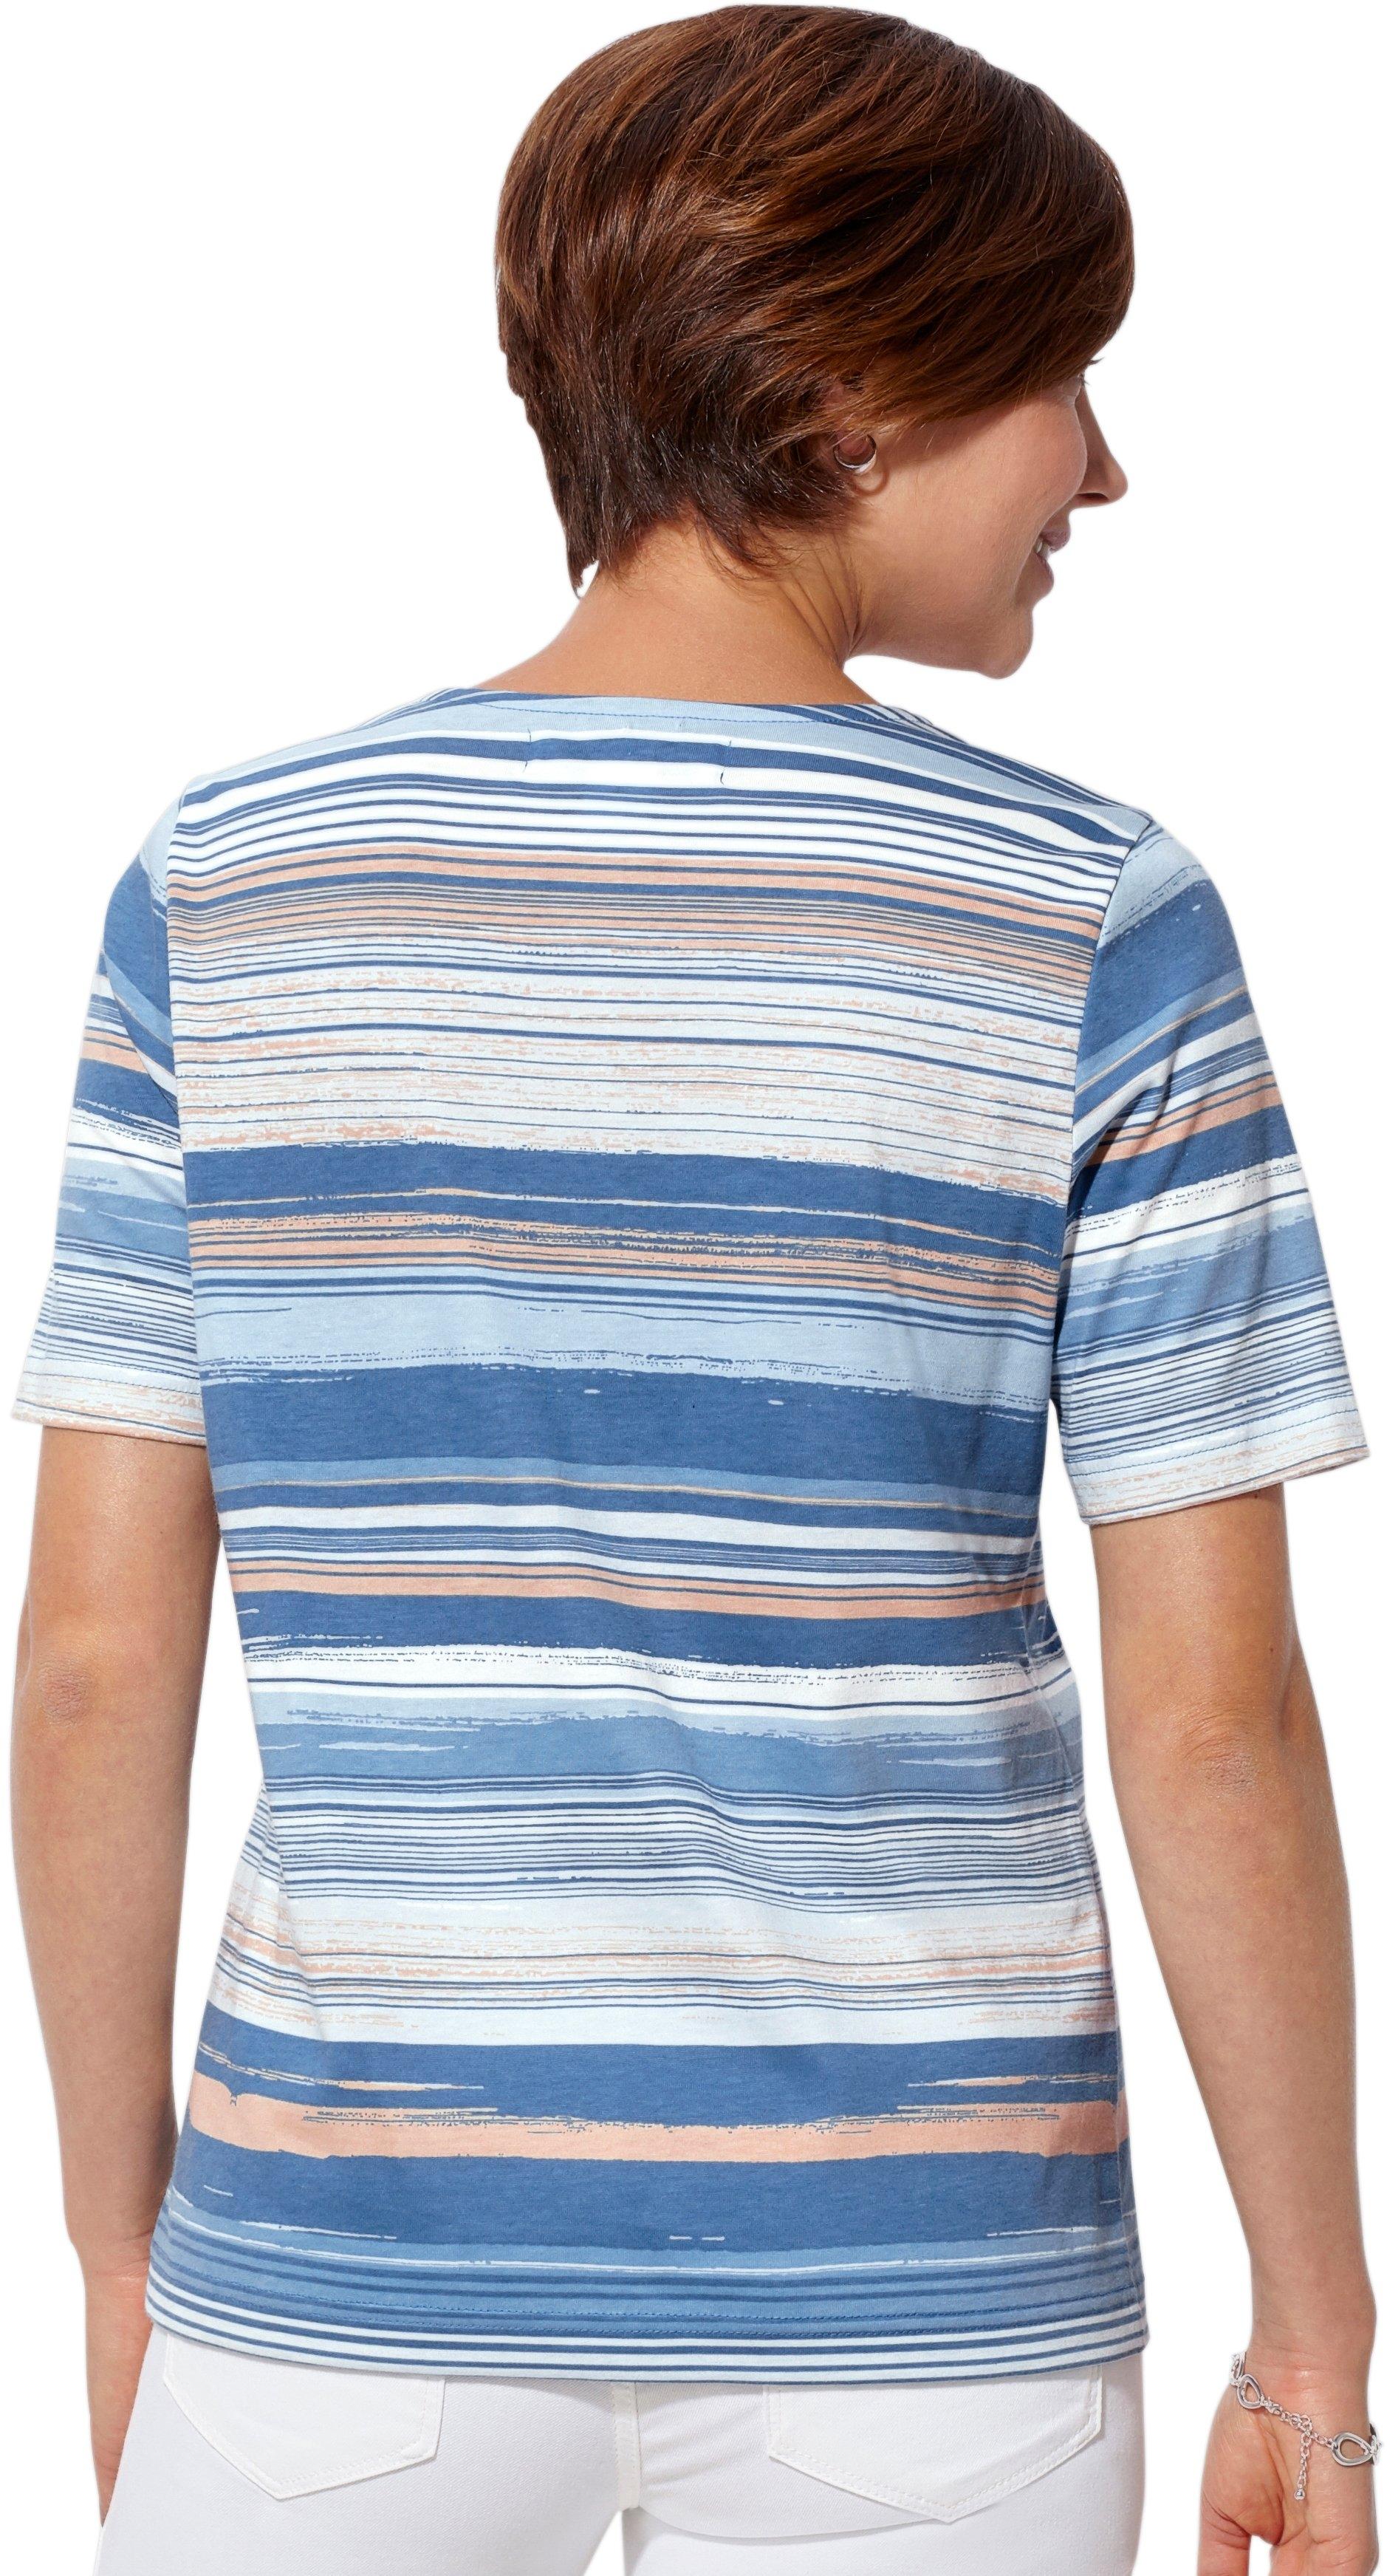 Harmonieus Online Looks Printdessin Casual Gekleurd Met Shirt Shoppen N8OPyvn0mw